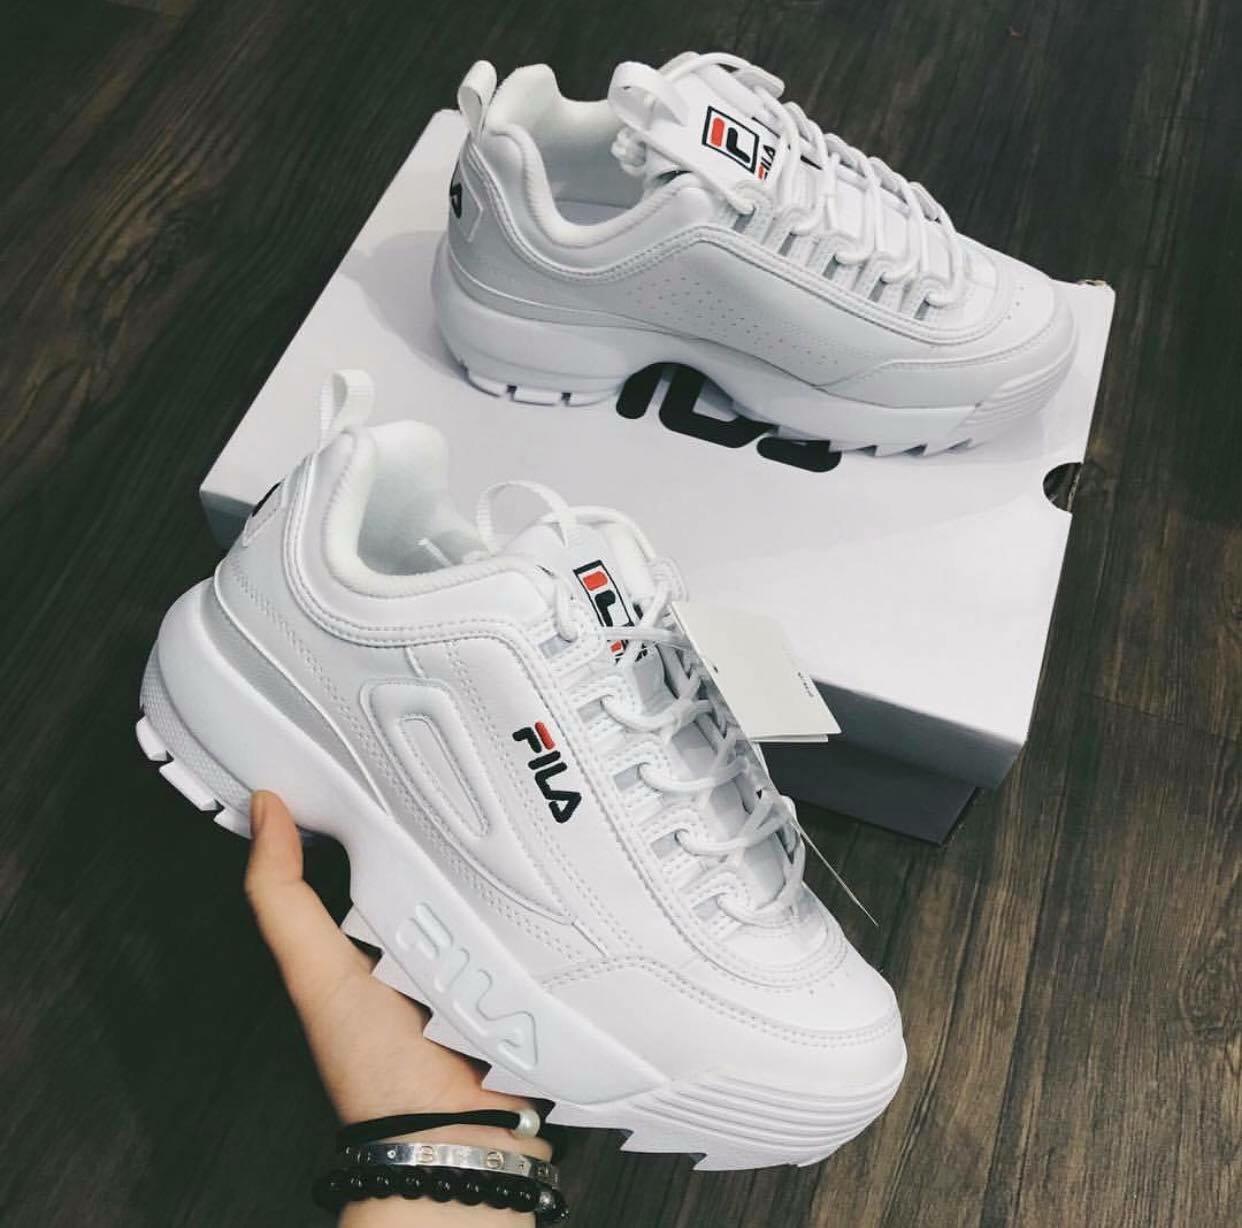 Giày thể thao FiLa